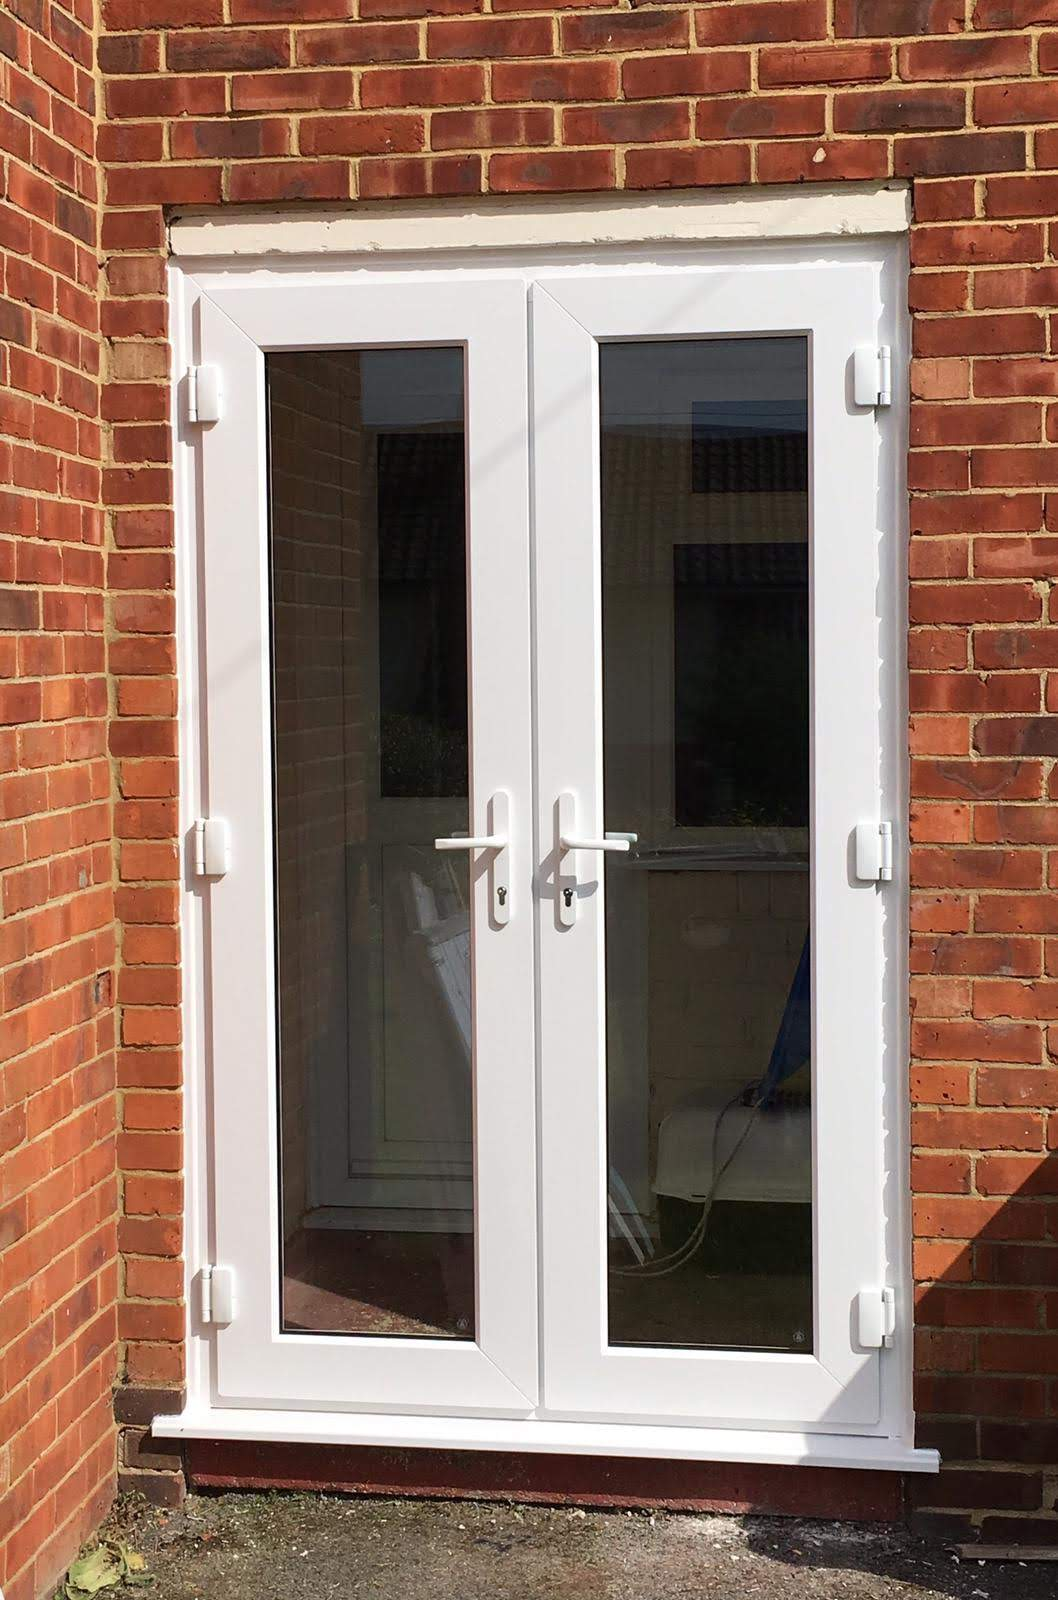 Front view of a new PVC front door model.